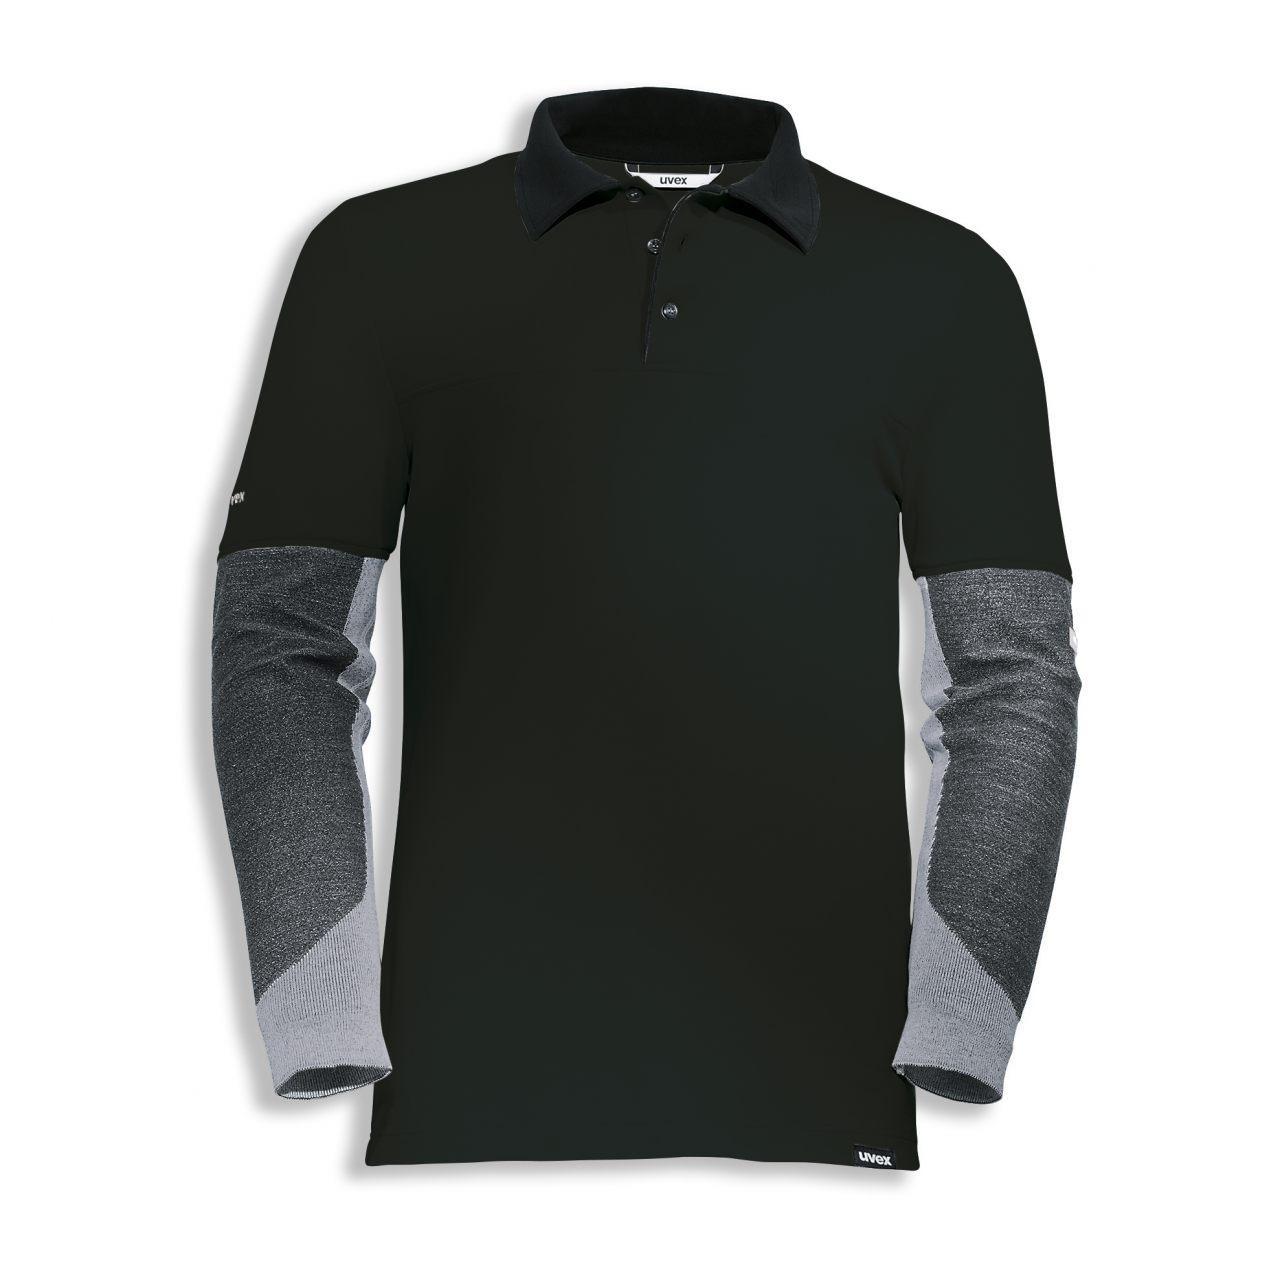 Printed INSTRUCTOR Work WorkWear Sport Workout Job T Shirt Top Tee